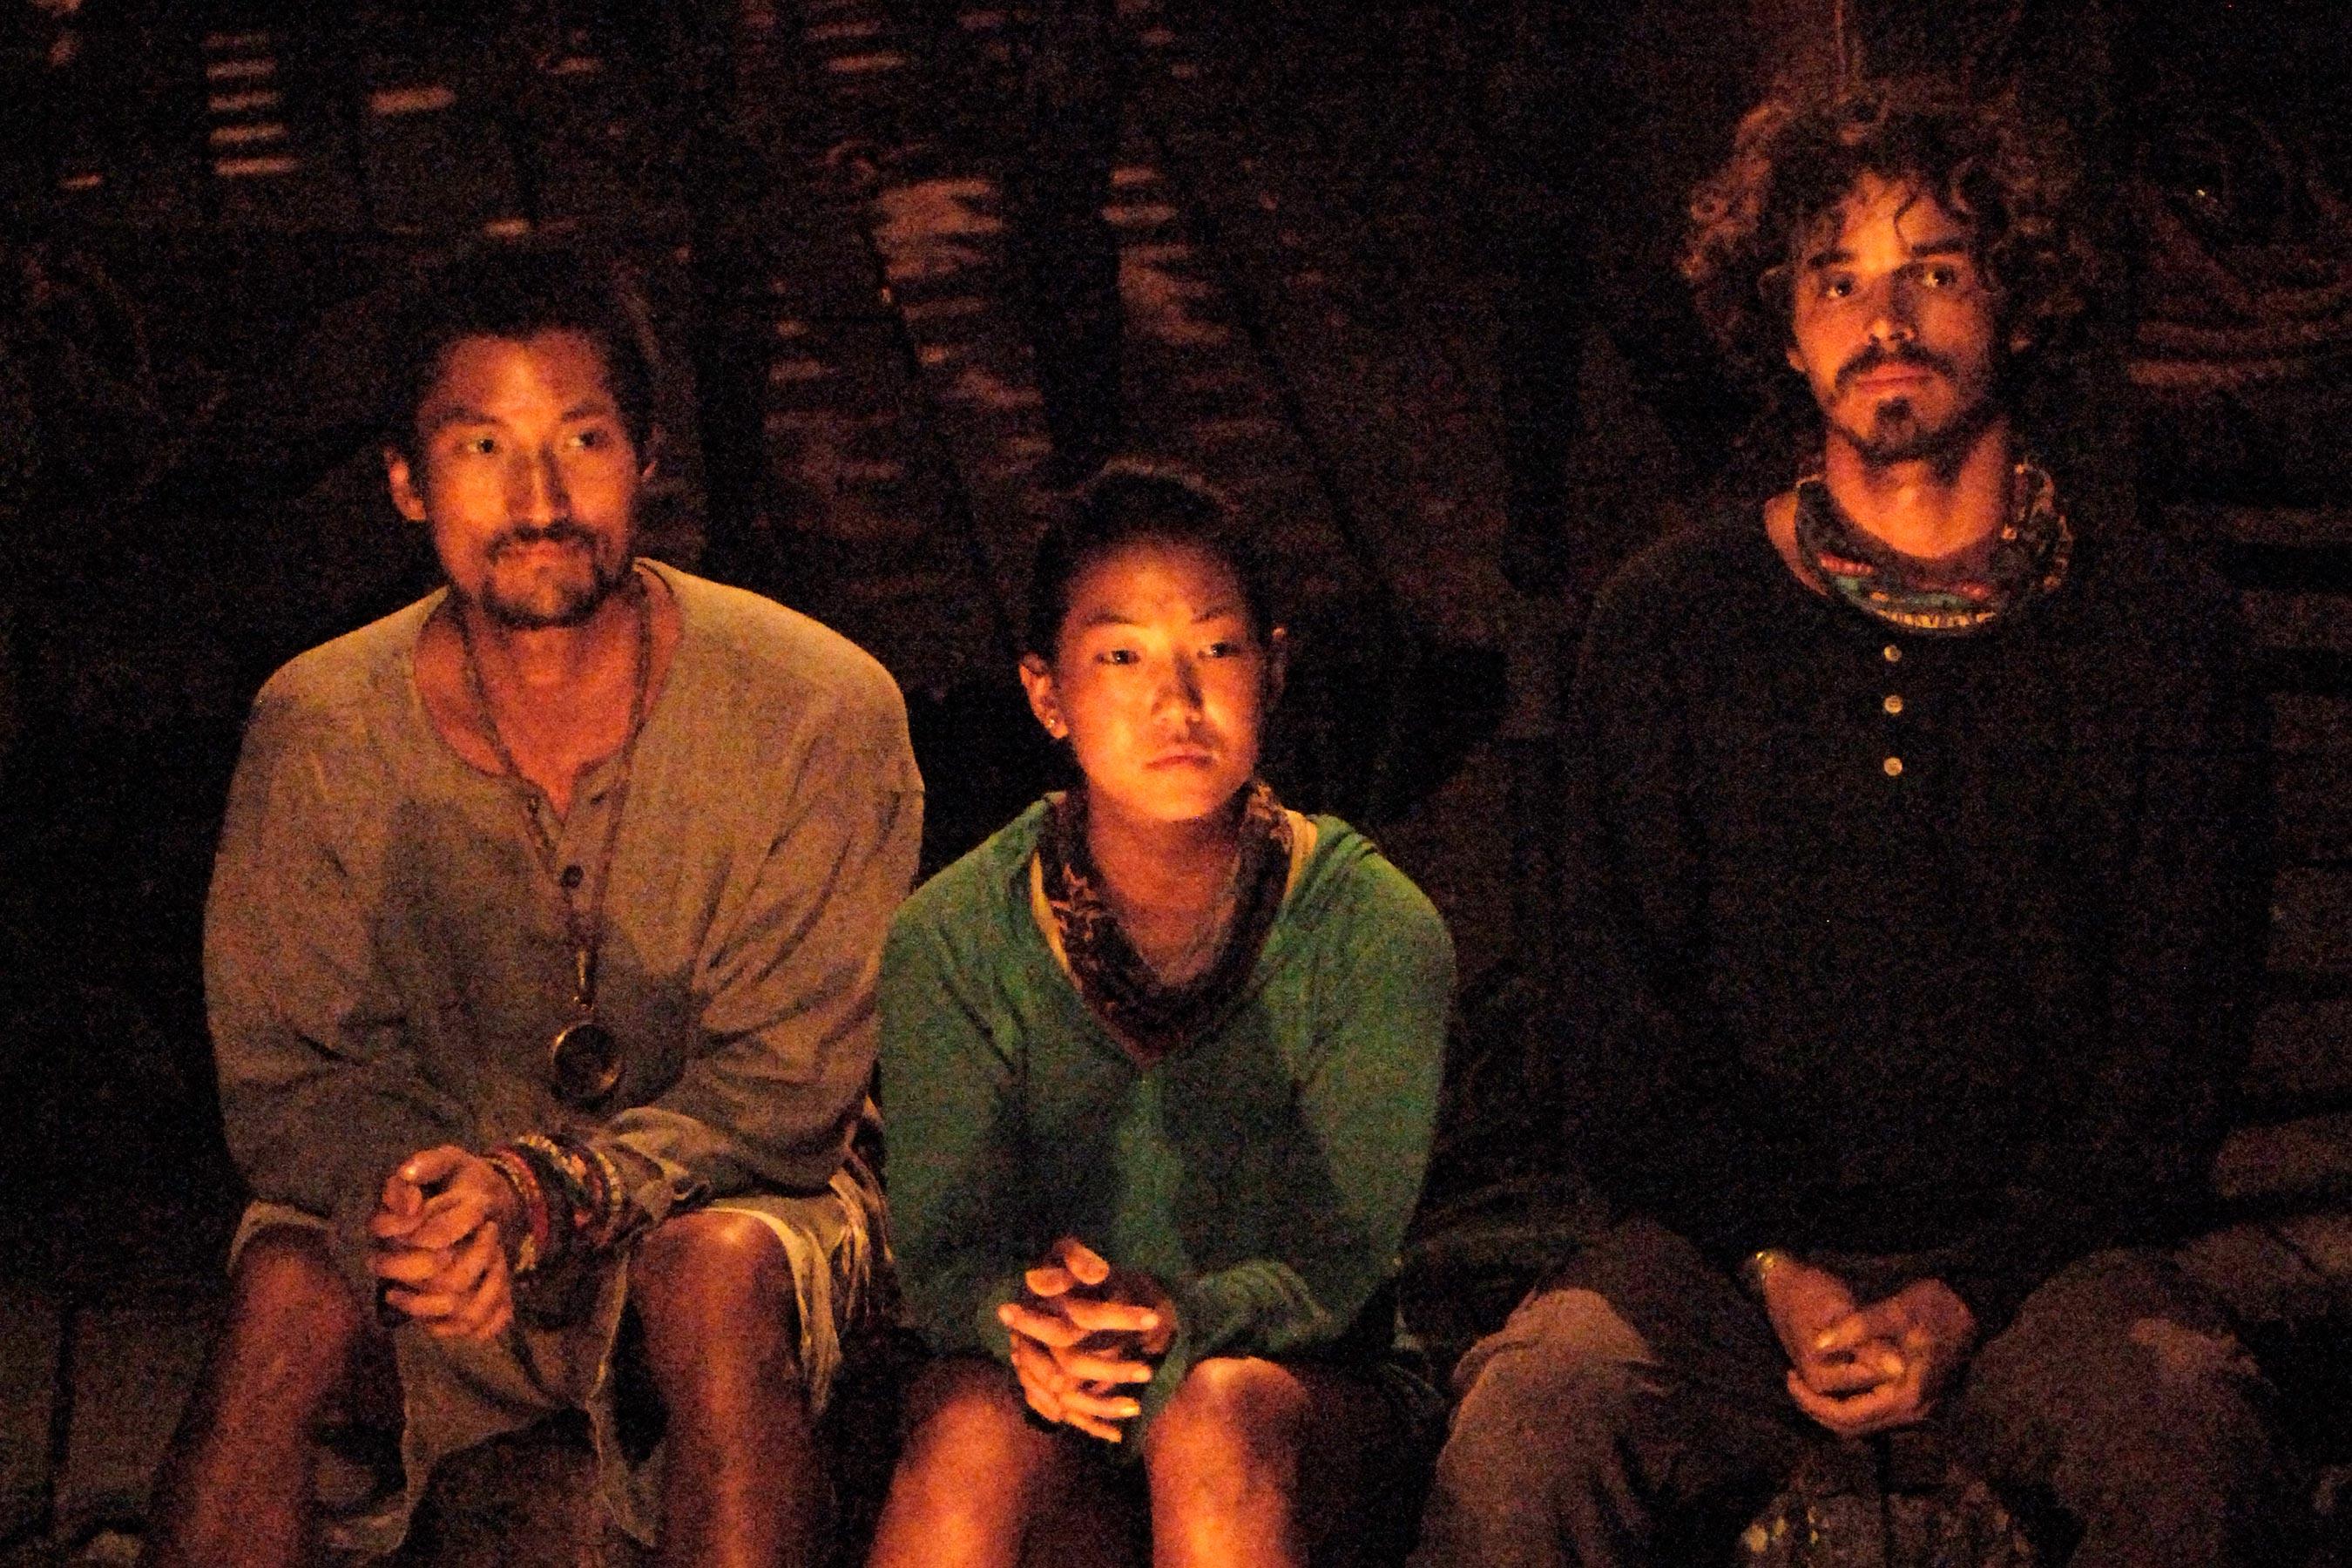 File:Cook islands final 3.jpg